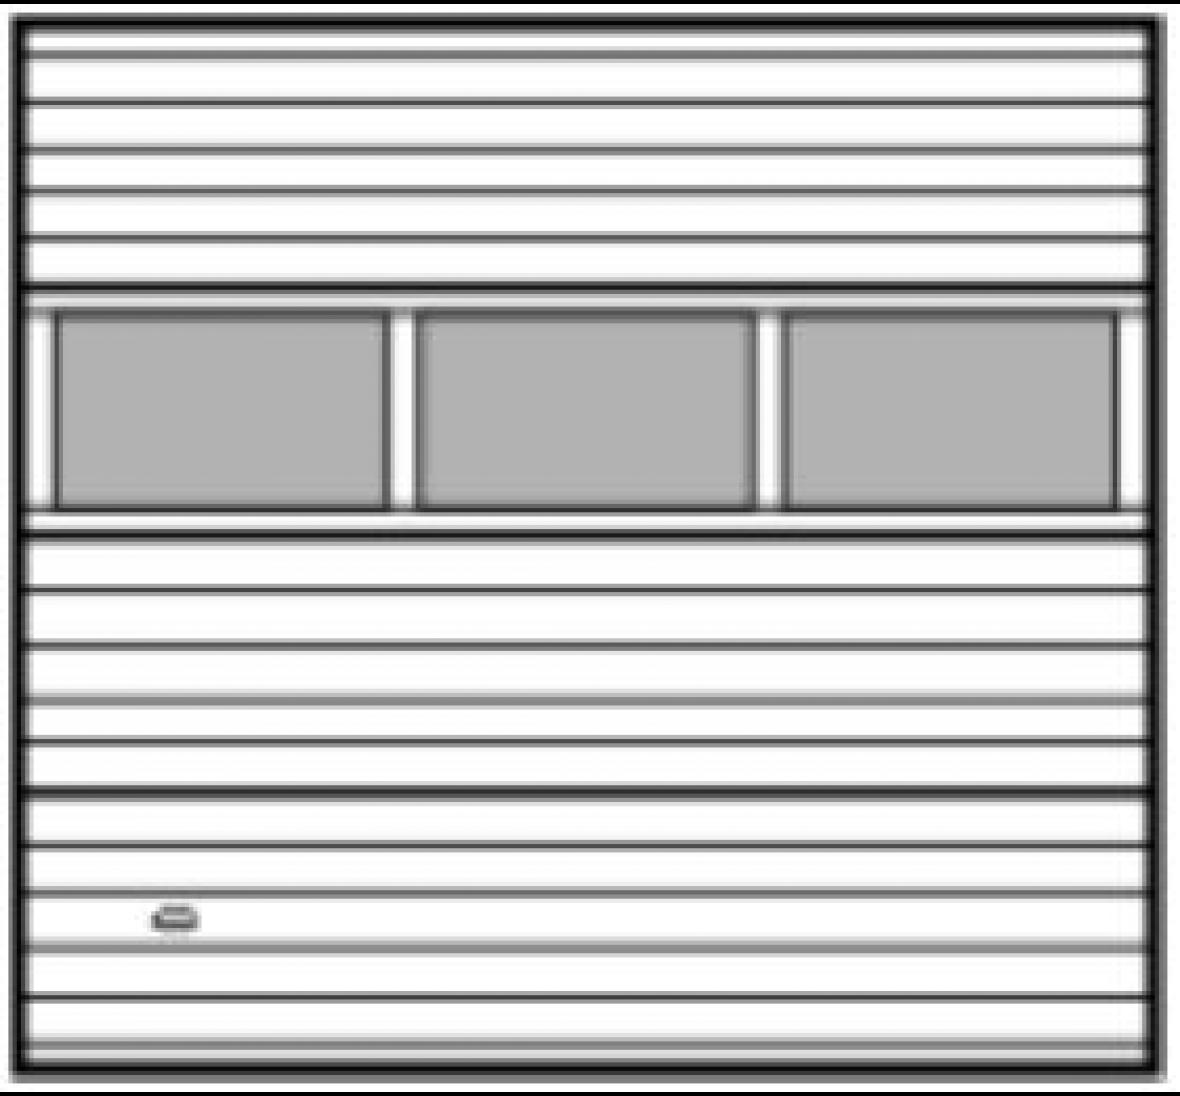 ST40 z panelem ALUDORO